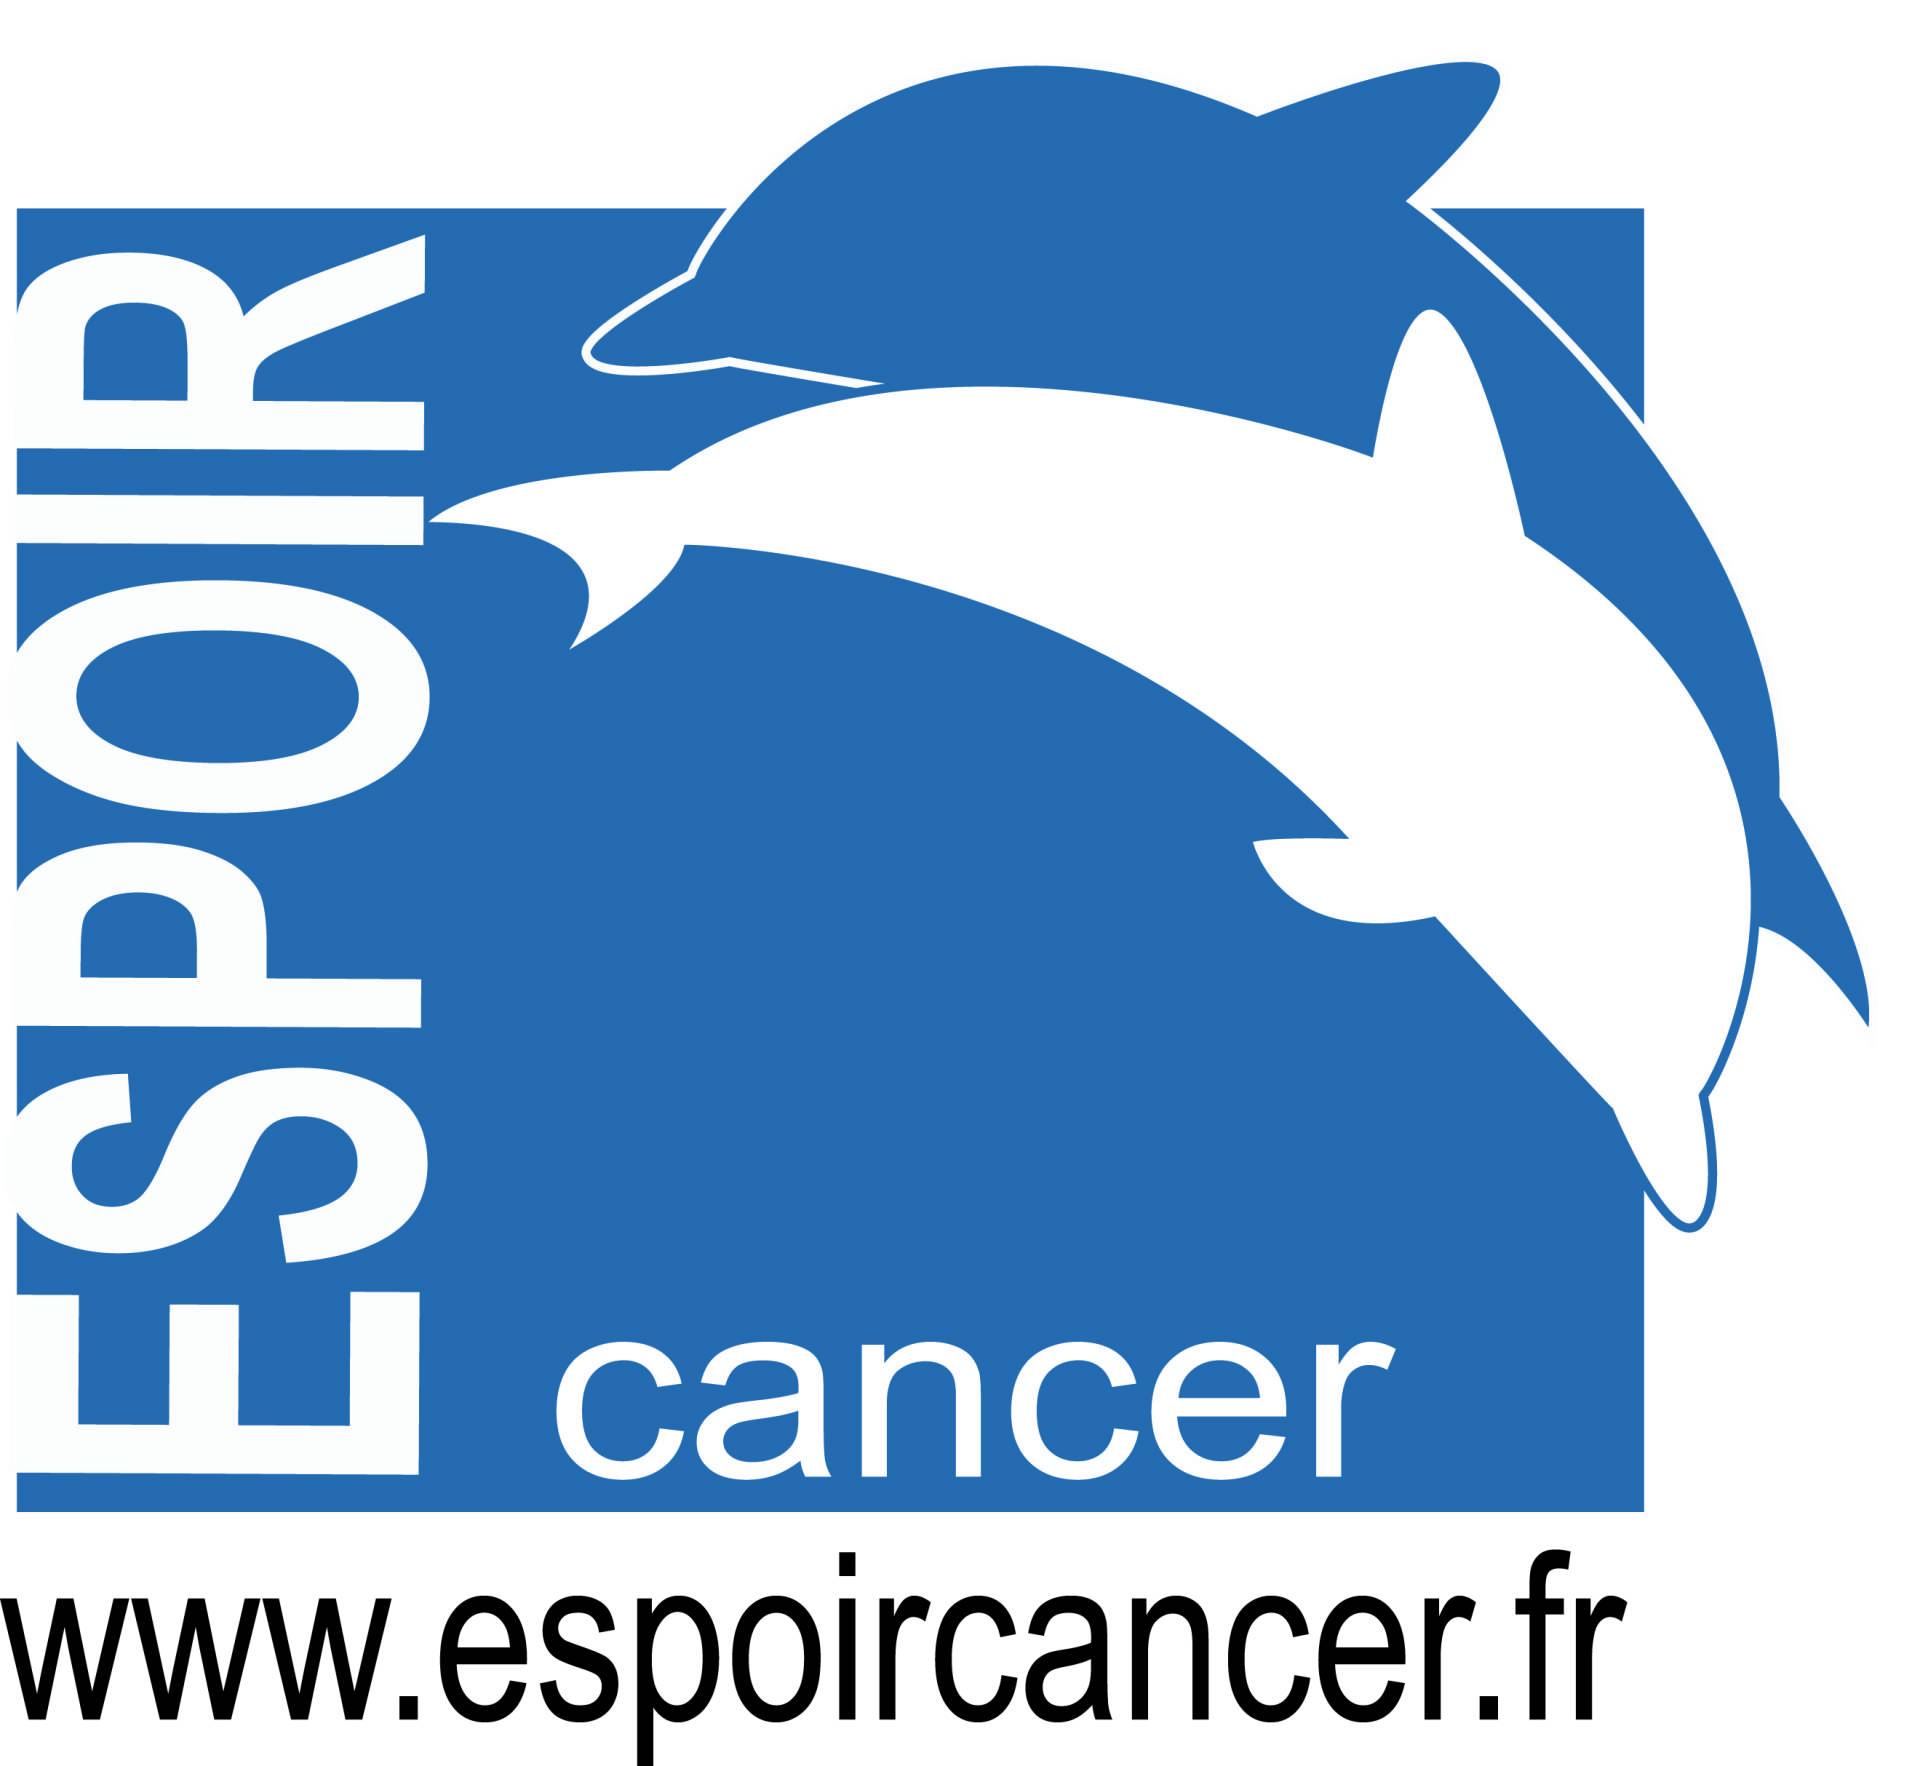 ESPOIR CANCER